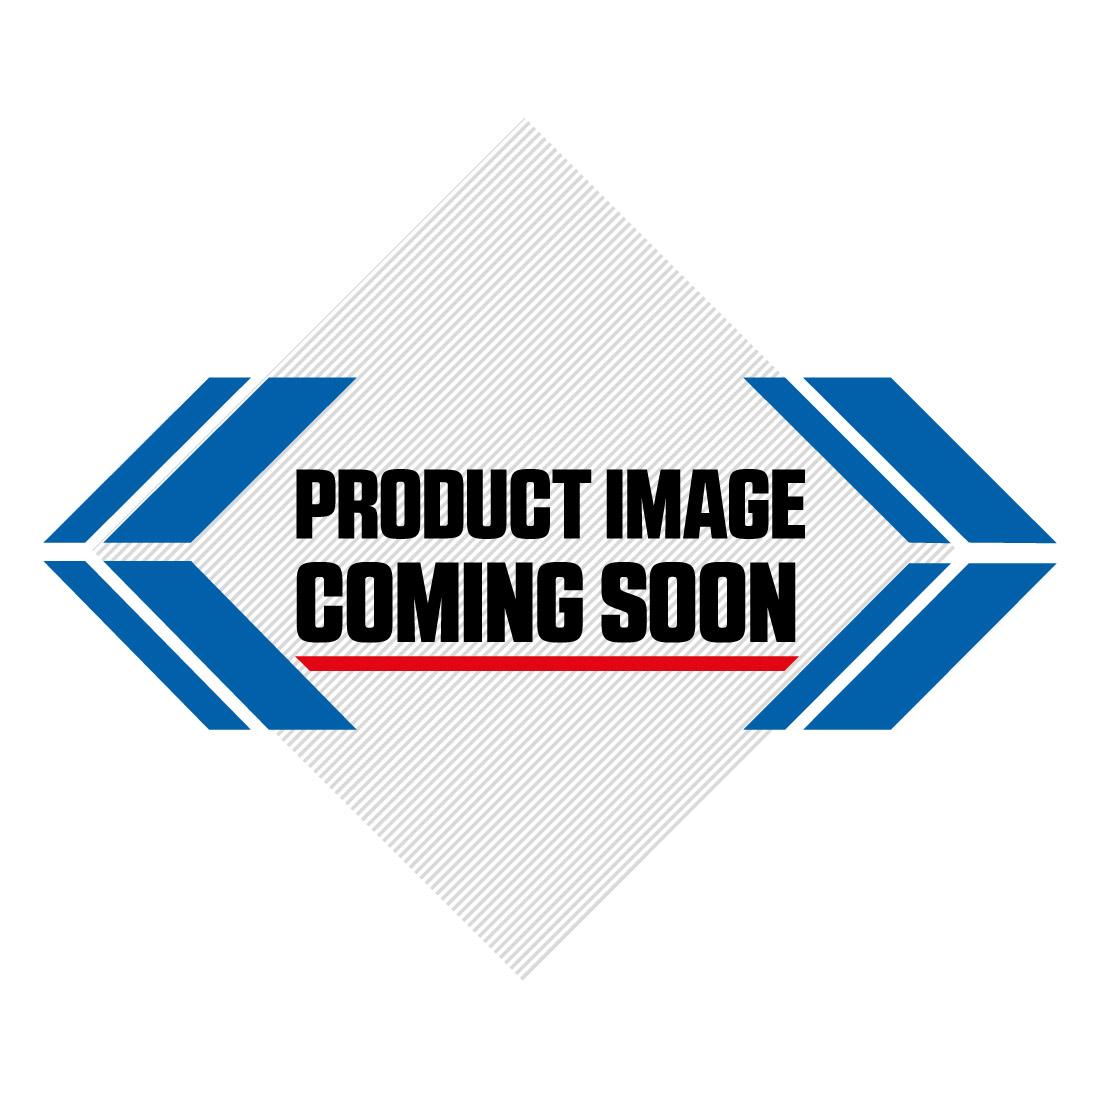 Kawasaki Restyled Plastic Kit KX 85 (01-09) (11-12) OEM Factory Image-5